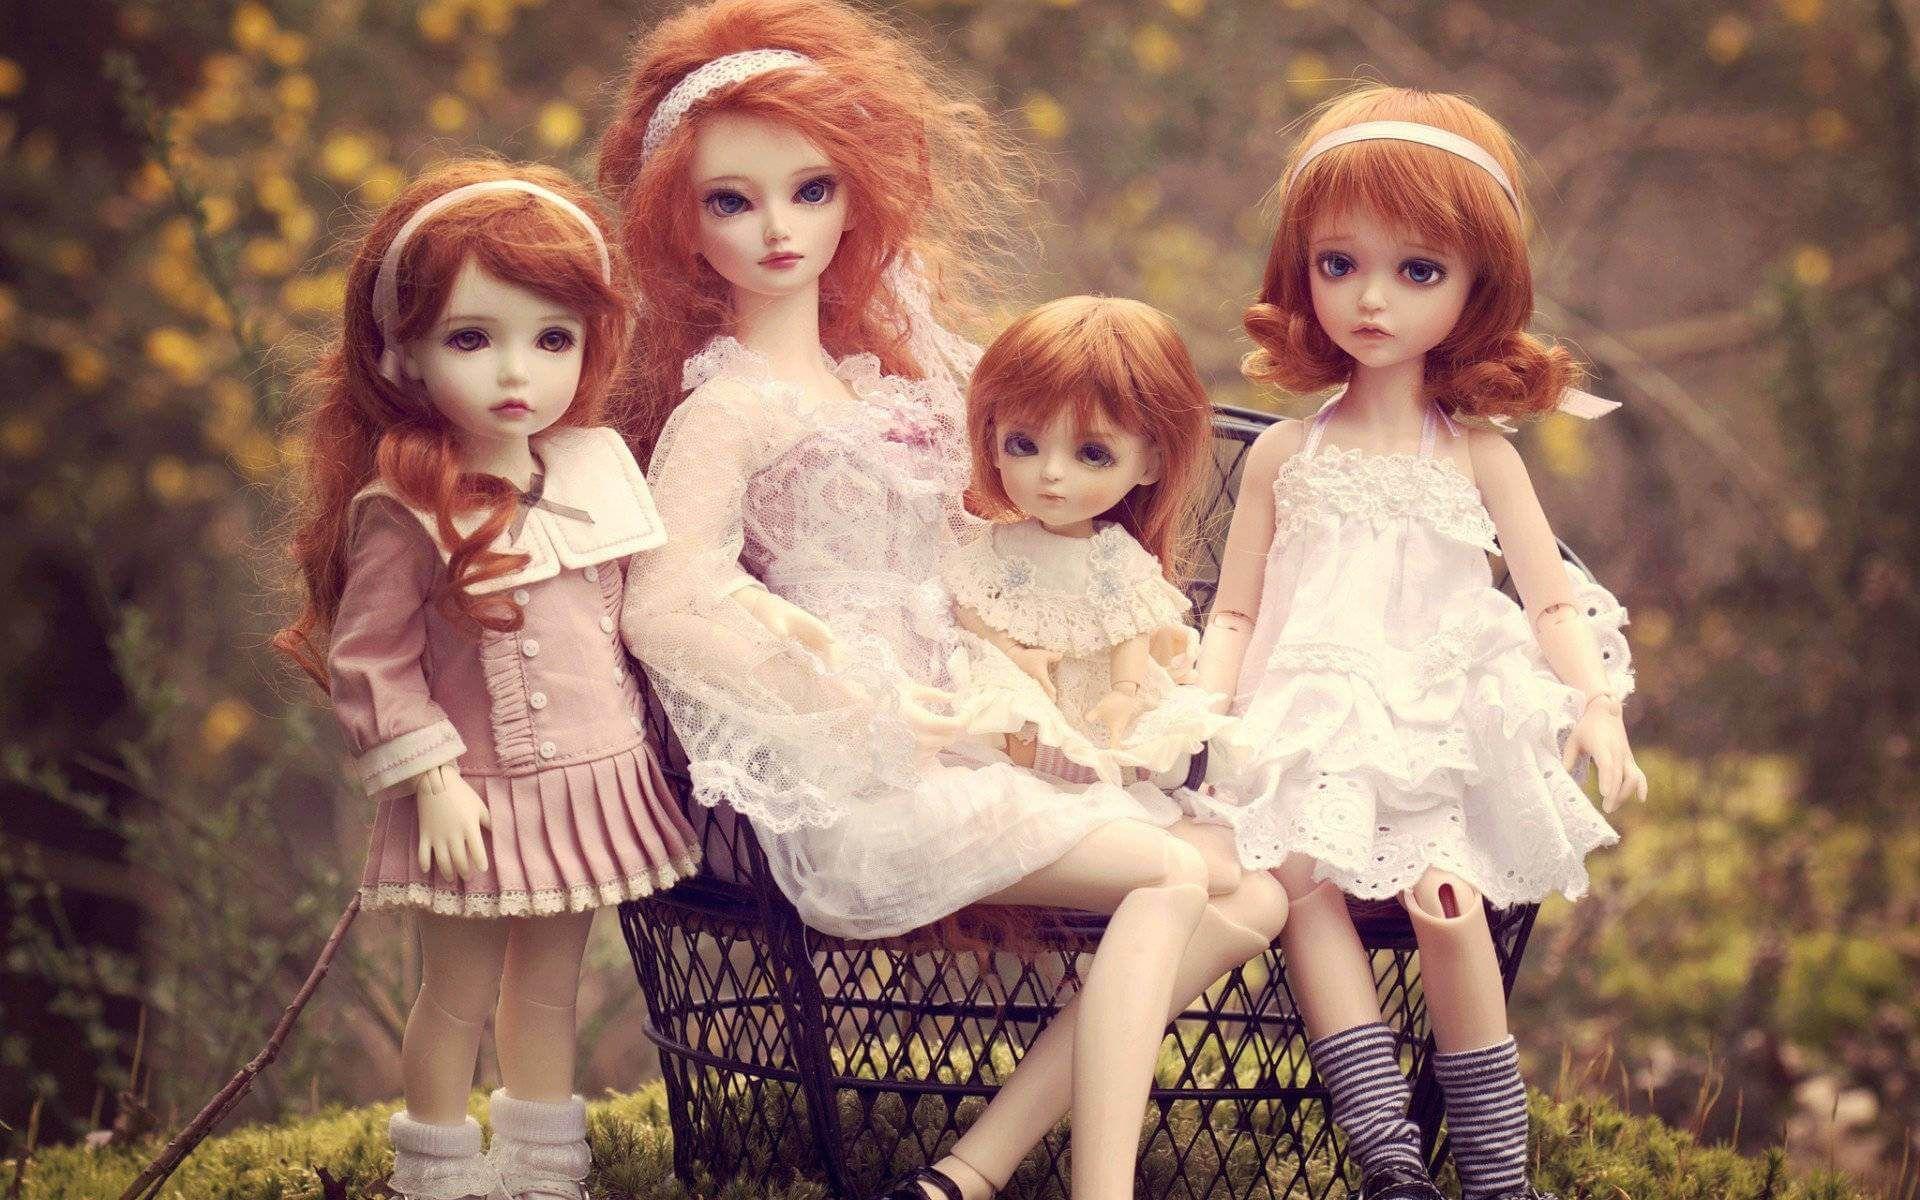 Cute Barbie Doll Wallpapers Hd Free Download Cute Baby Girl Wallpaper Baby Girl Wallpaper Beautiful Barbie Dolls